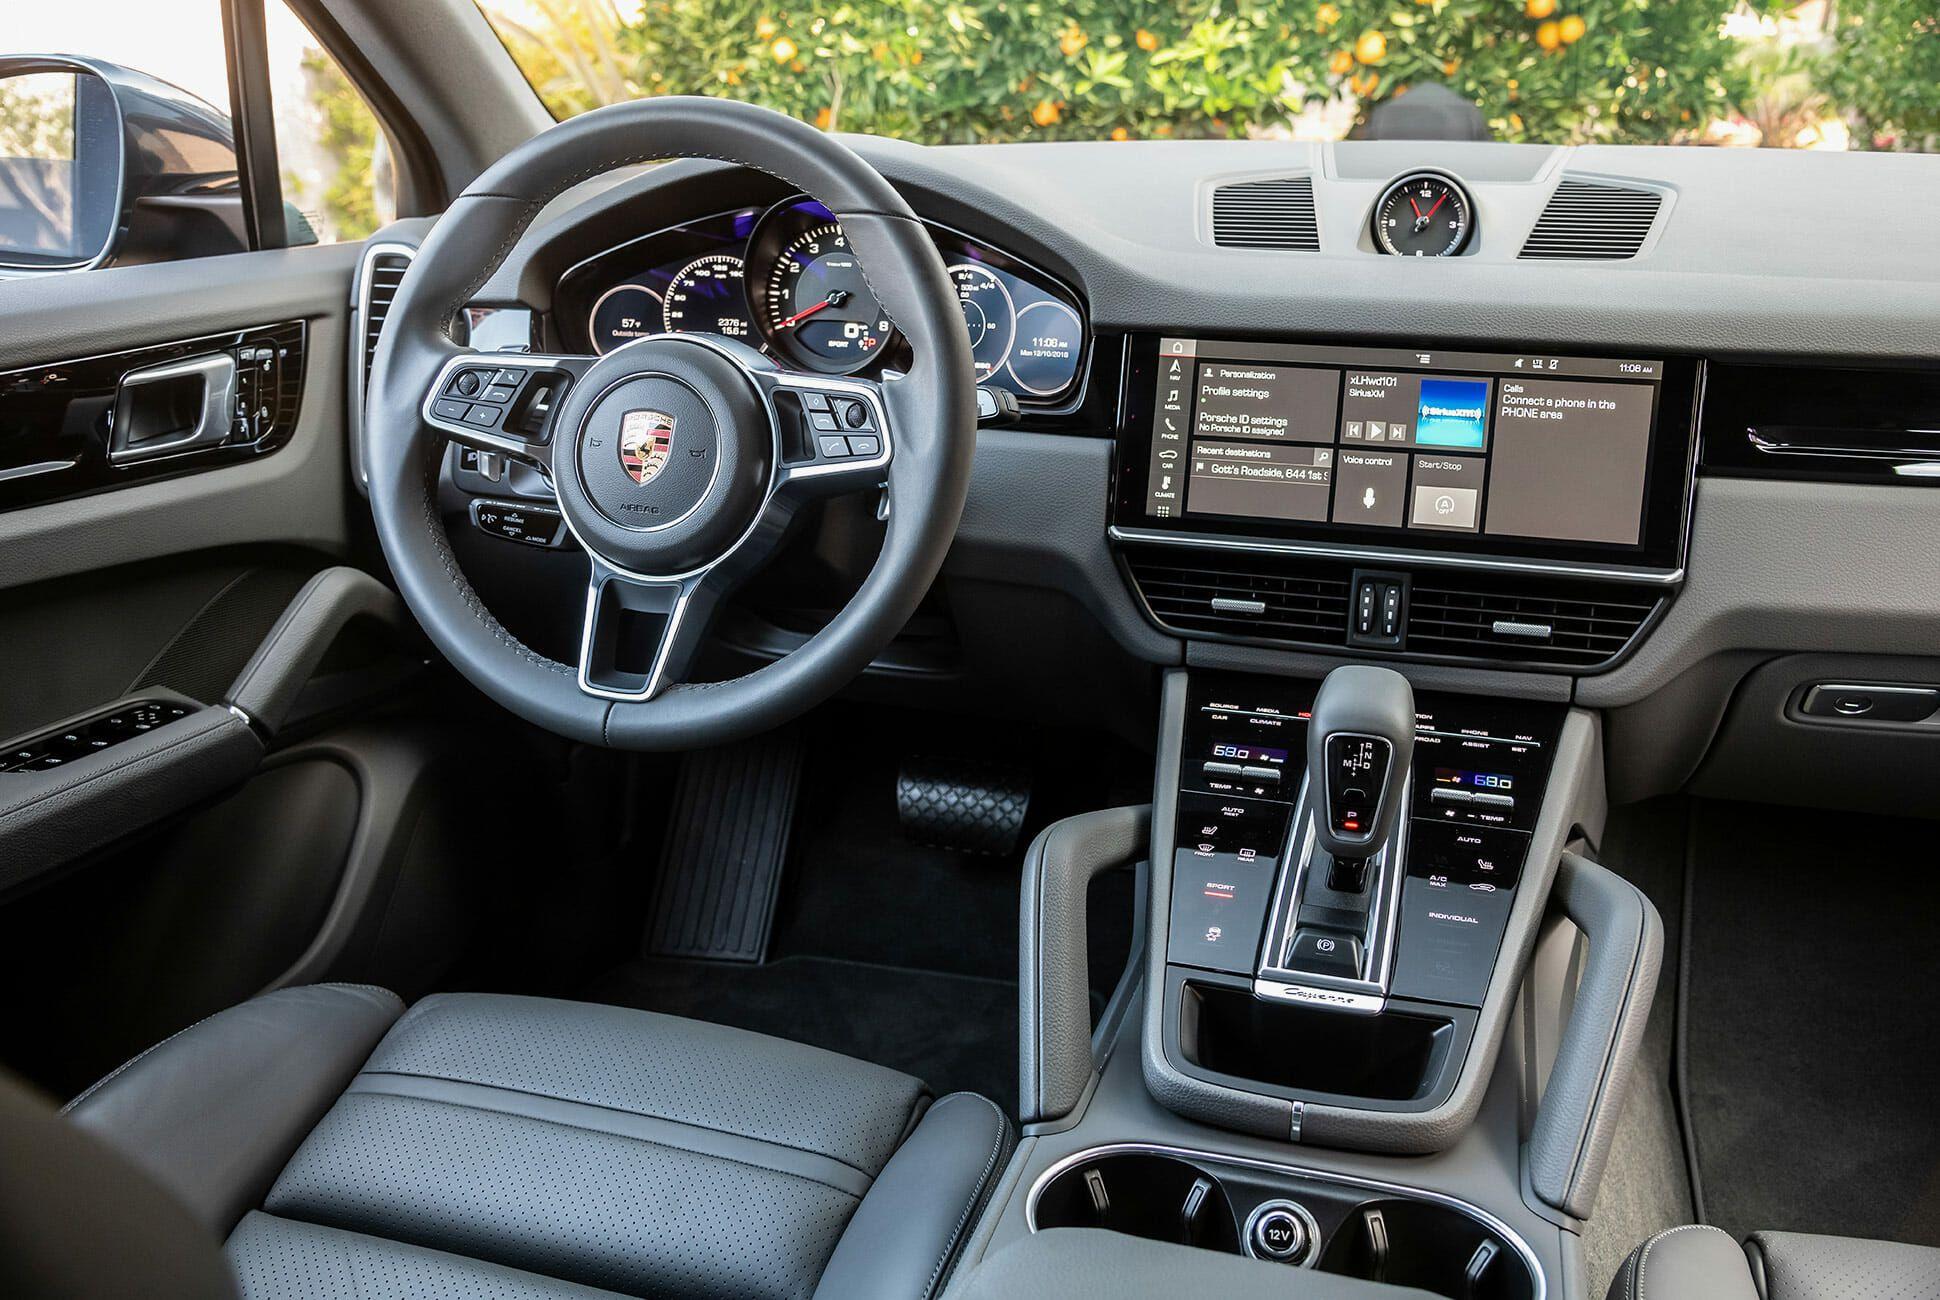 Porsche-Cayenne-Review-gear-patrol-slide-5